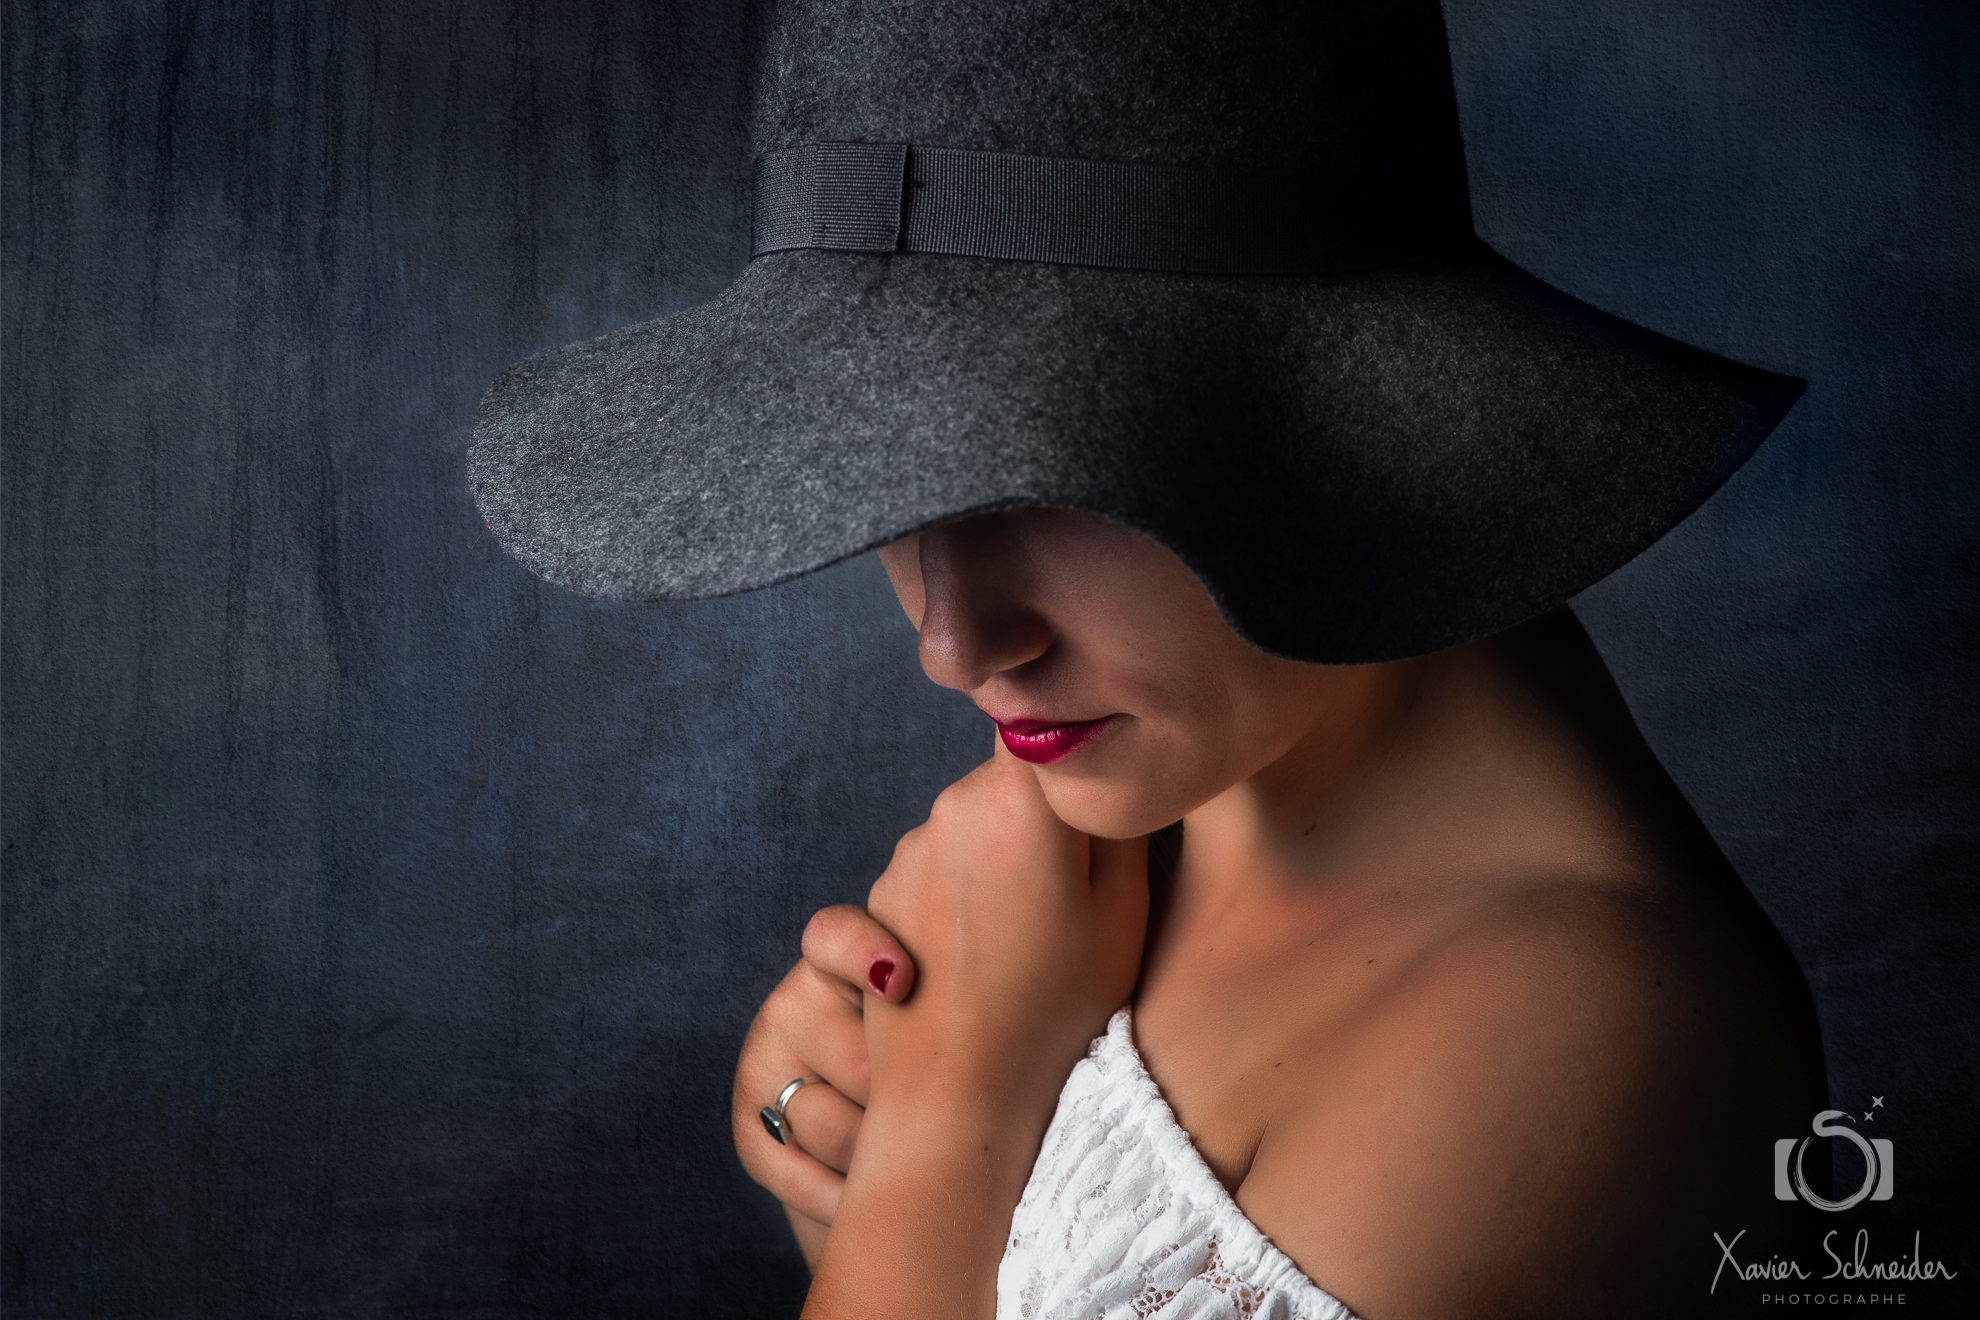 femme chapeau texture grunge